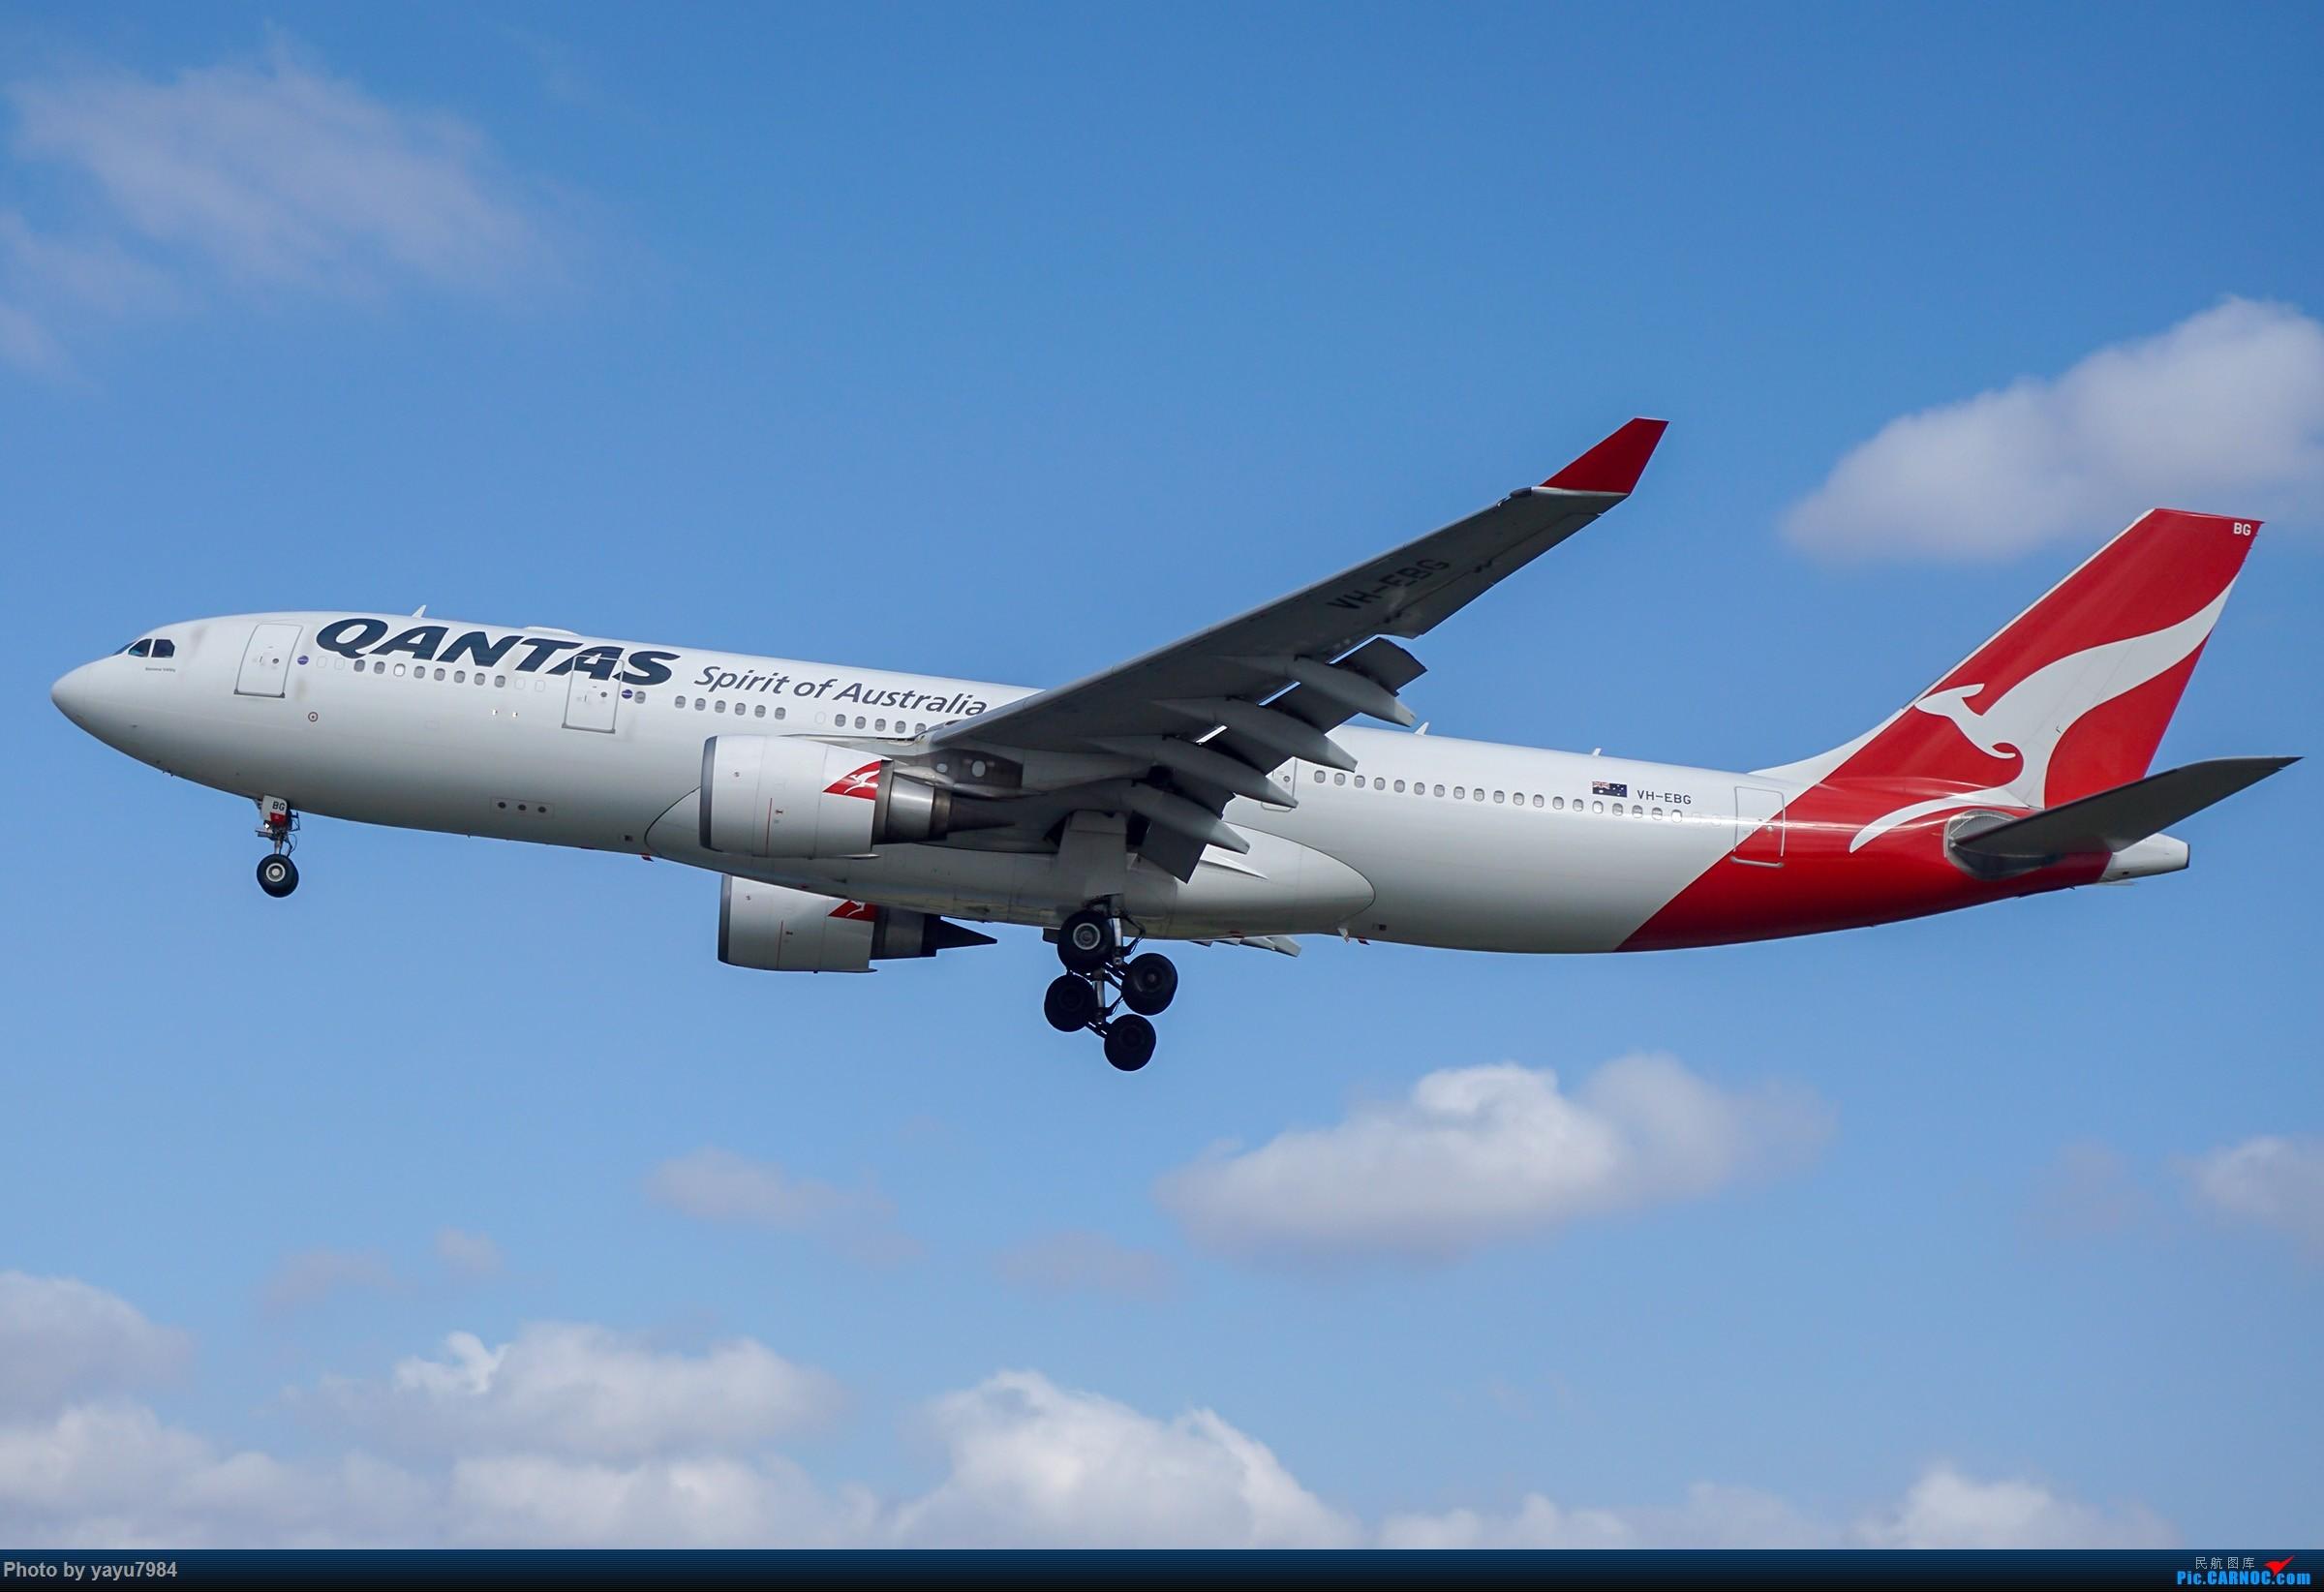 Re:[原创][SYD] 东航天合332,雪绒花343,华航蓝鹊,以及其他日常货 AIRBUS A330-200 VH-EBG 澳大利亚悉尼金斯福德·史密斯机场